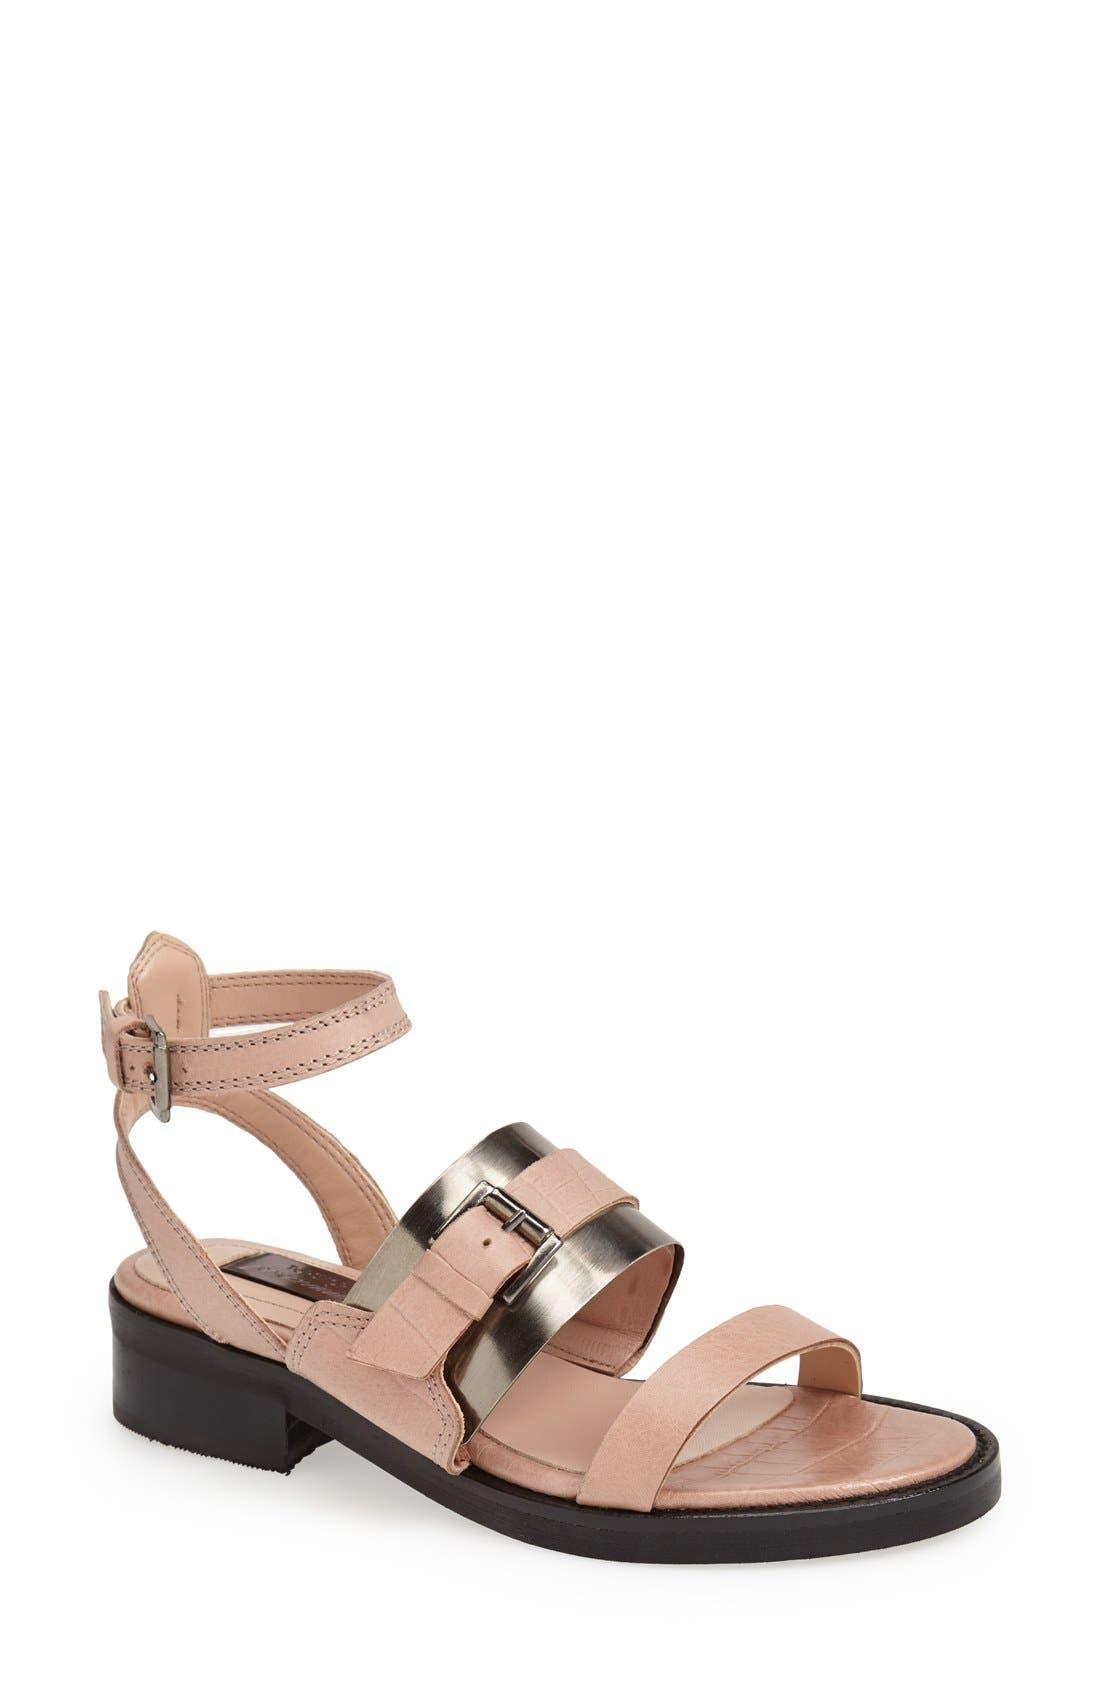 Main Image - Topshop 'Premium - Preeta' Ankle Strap Sandal (Women)